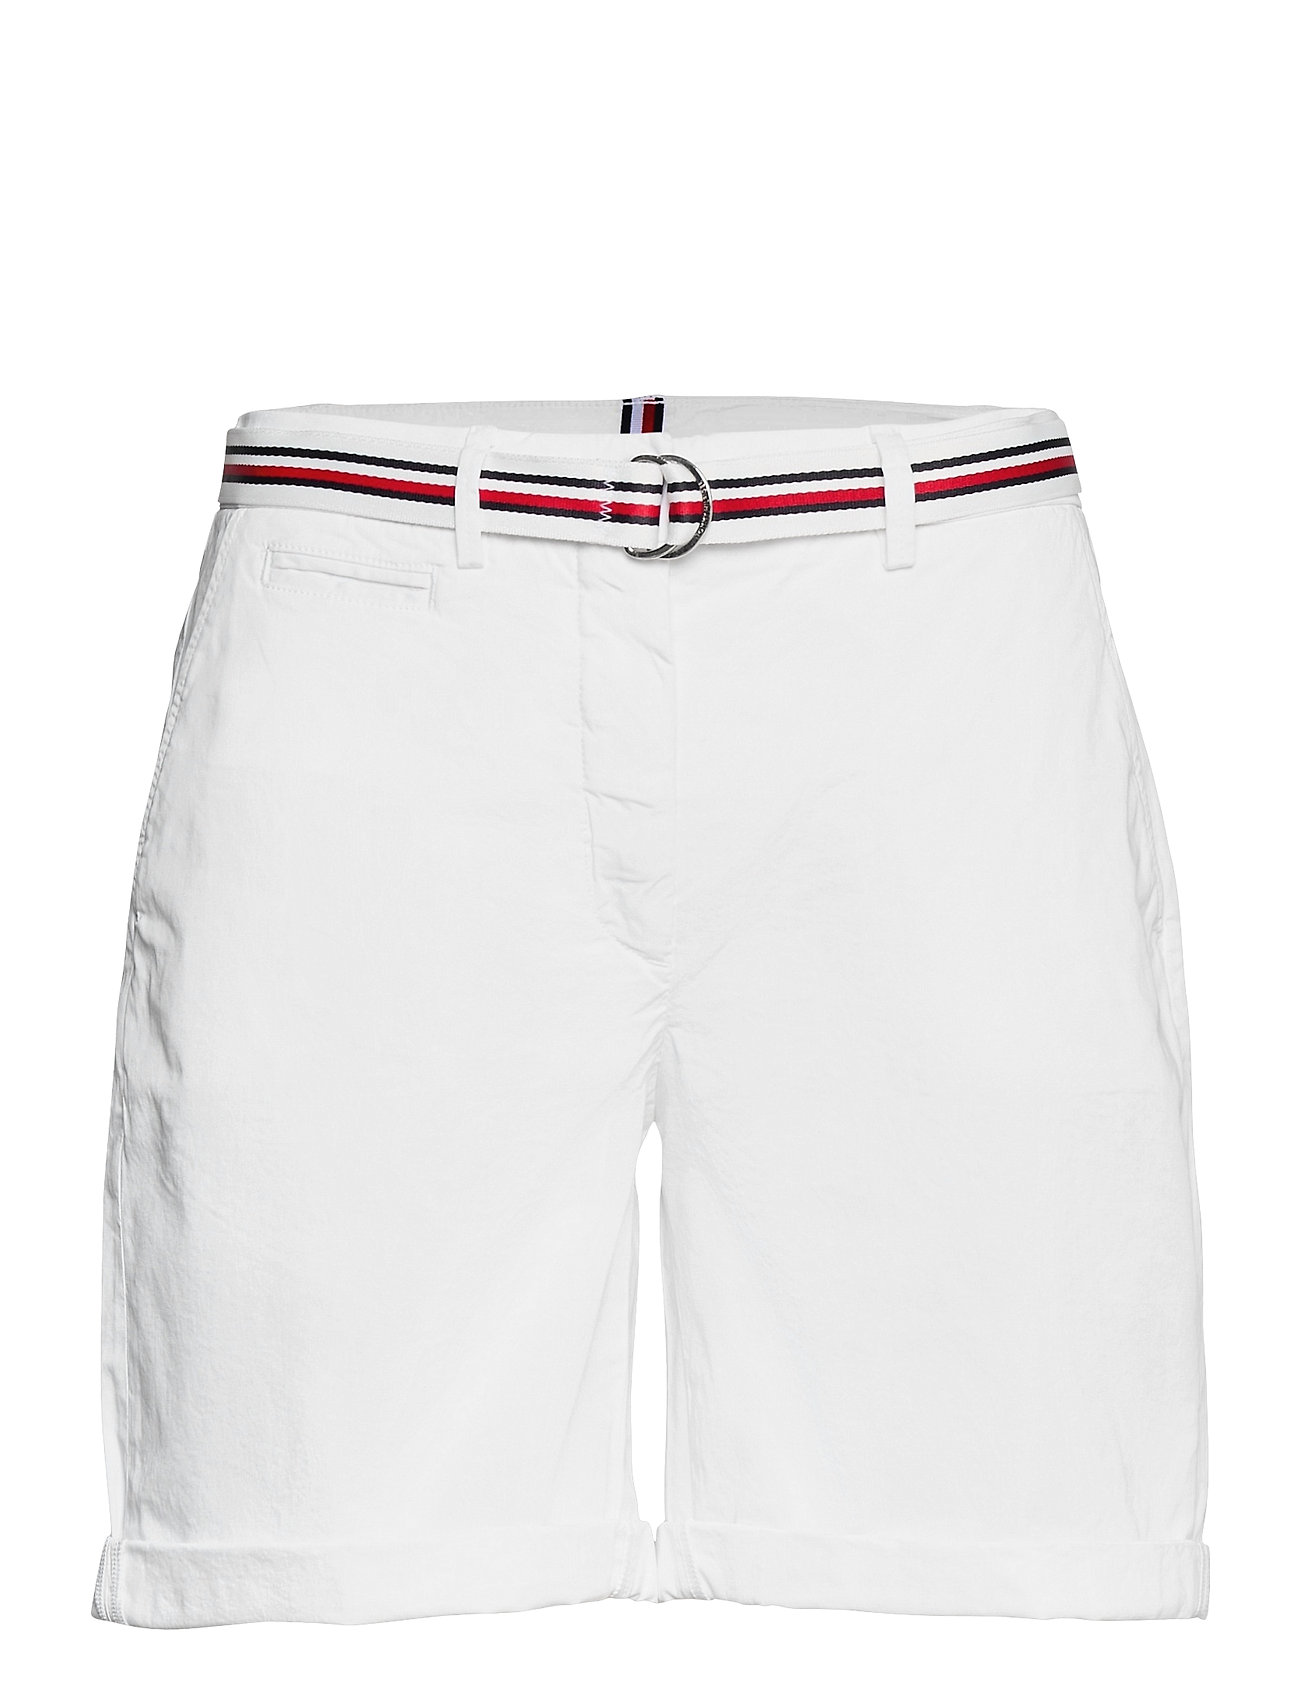 Image of Cotton Tencel Chino Rw Short Shorts Chino Shorts Hvid Tommy Hilfiger (3507356585)